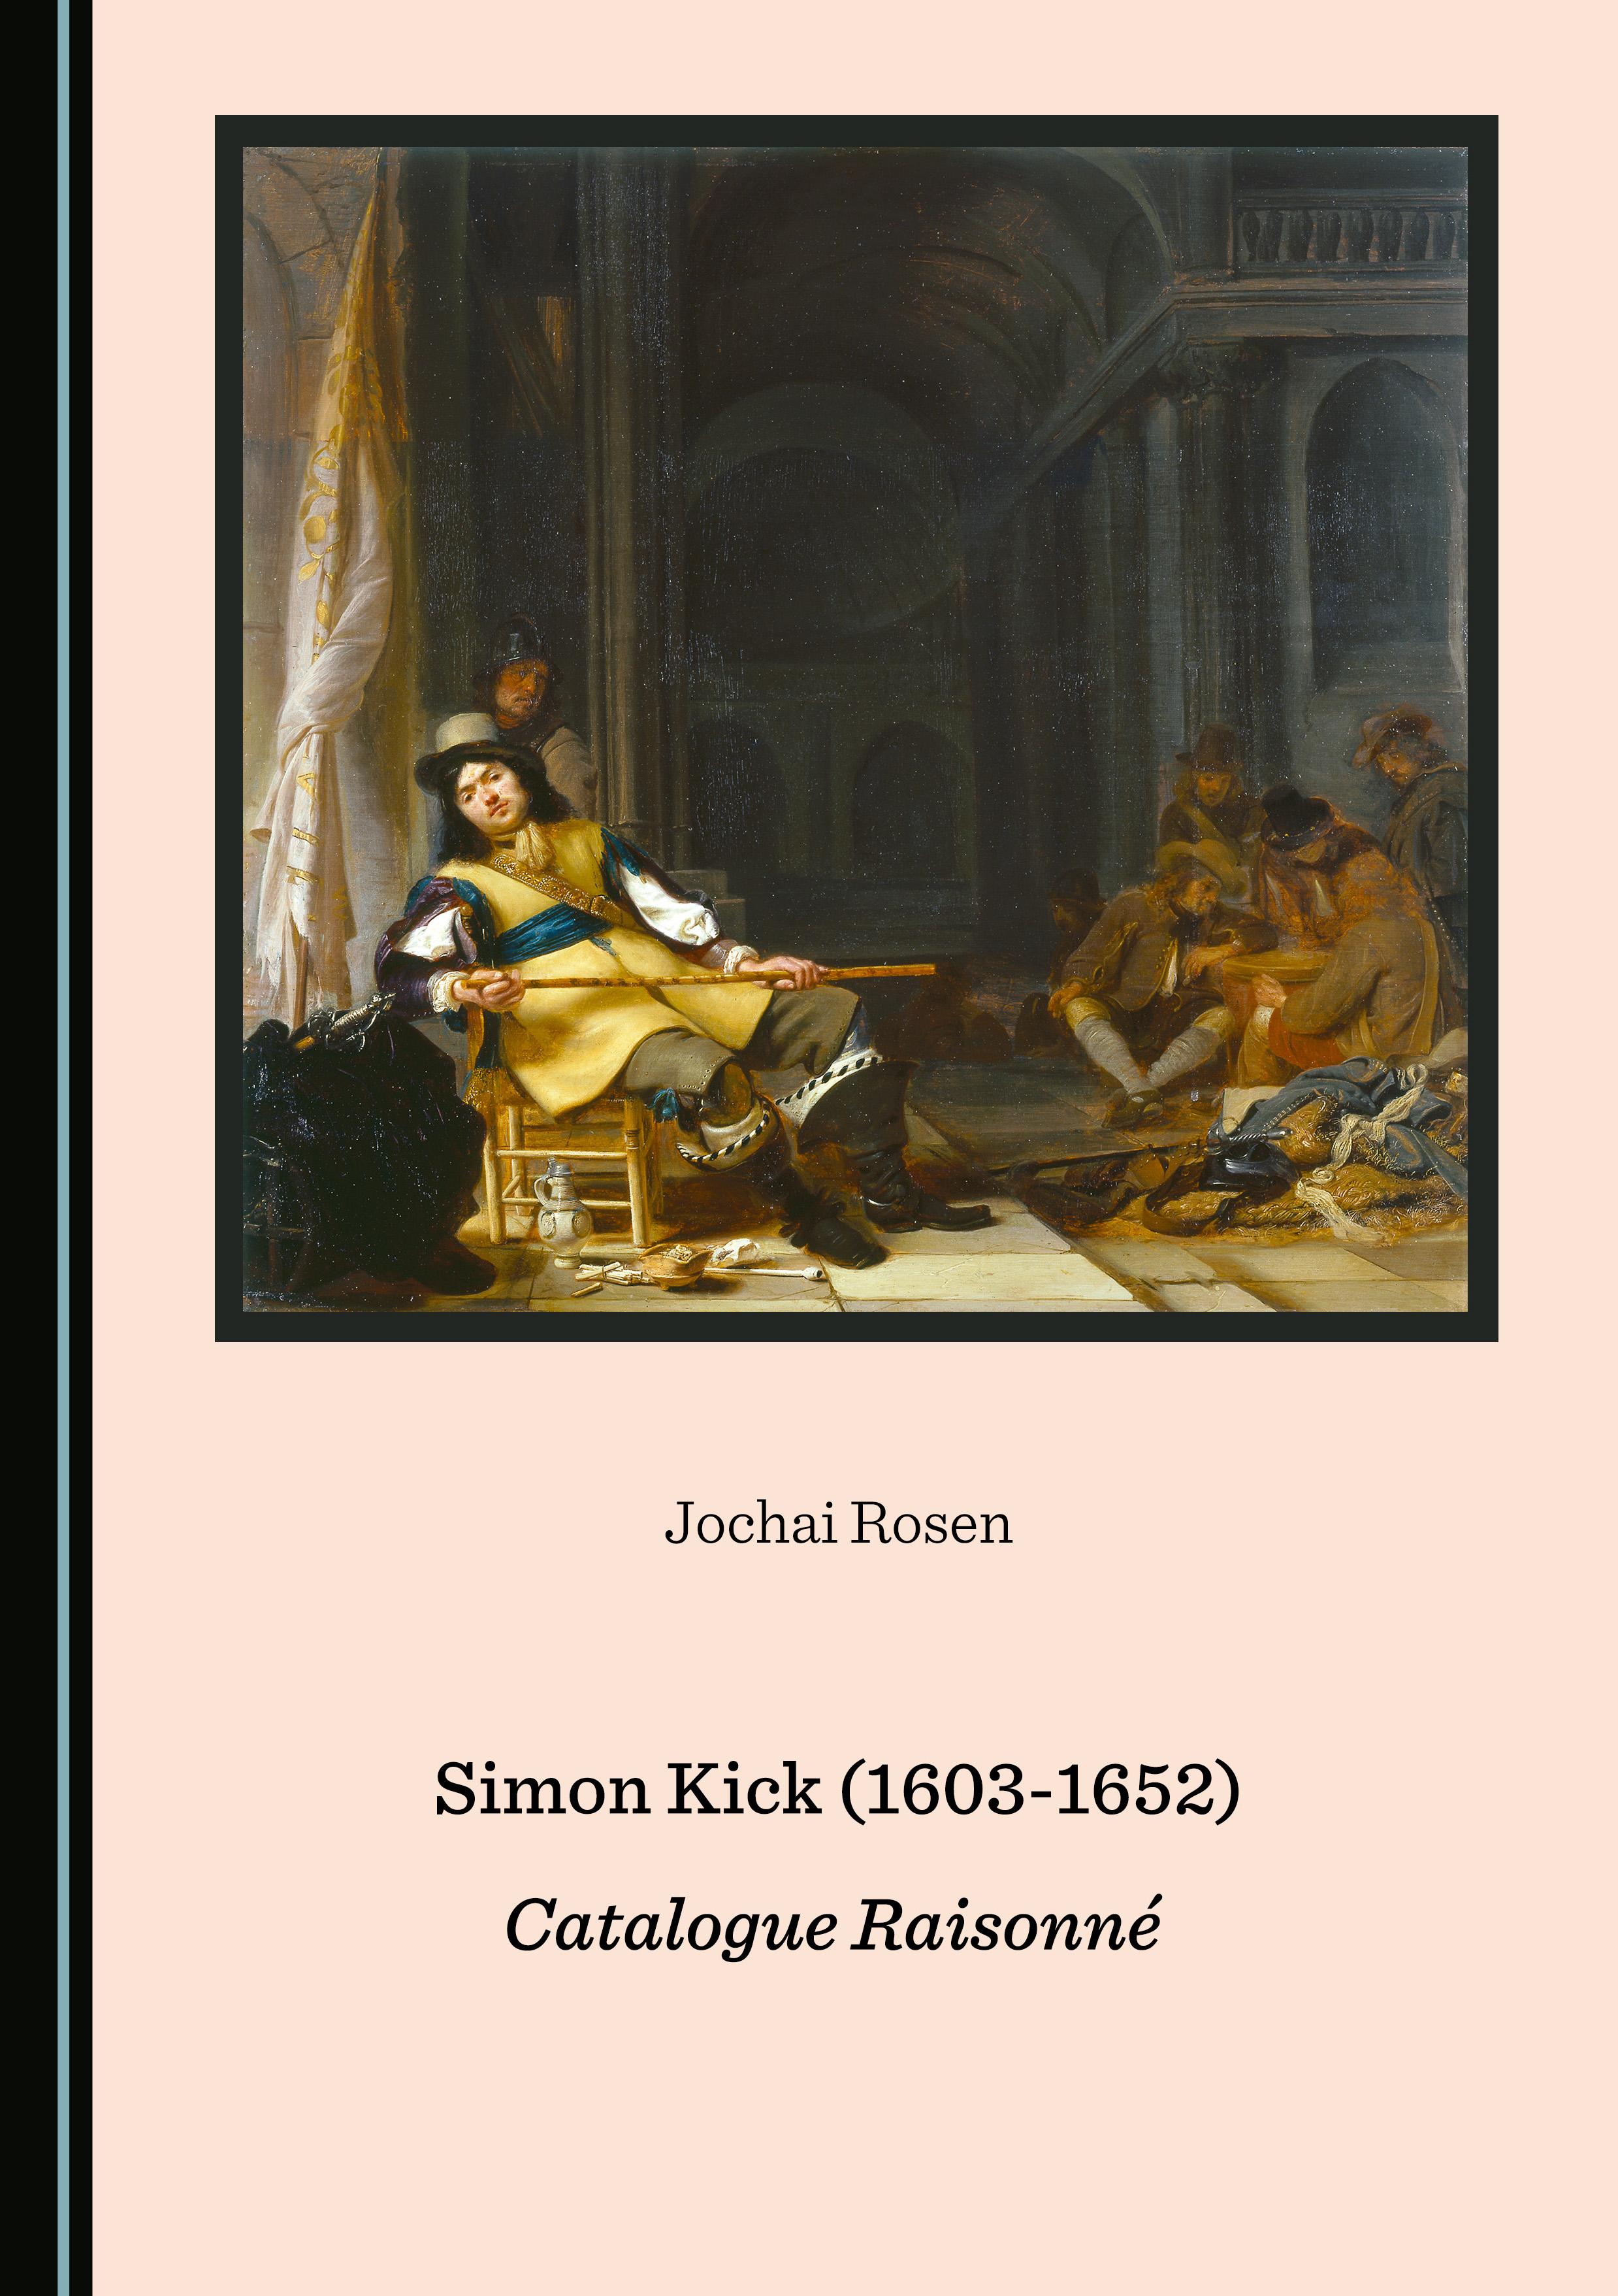 Simon Kick (1603-1652): Catalogue Raisonné